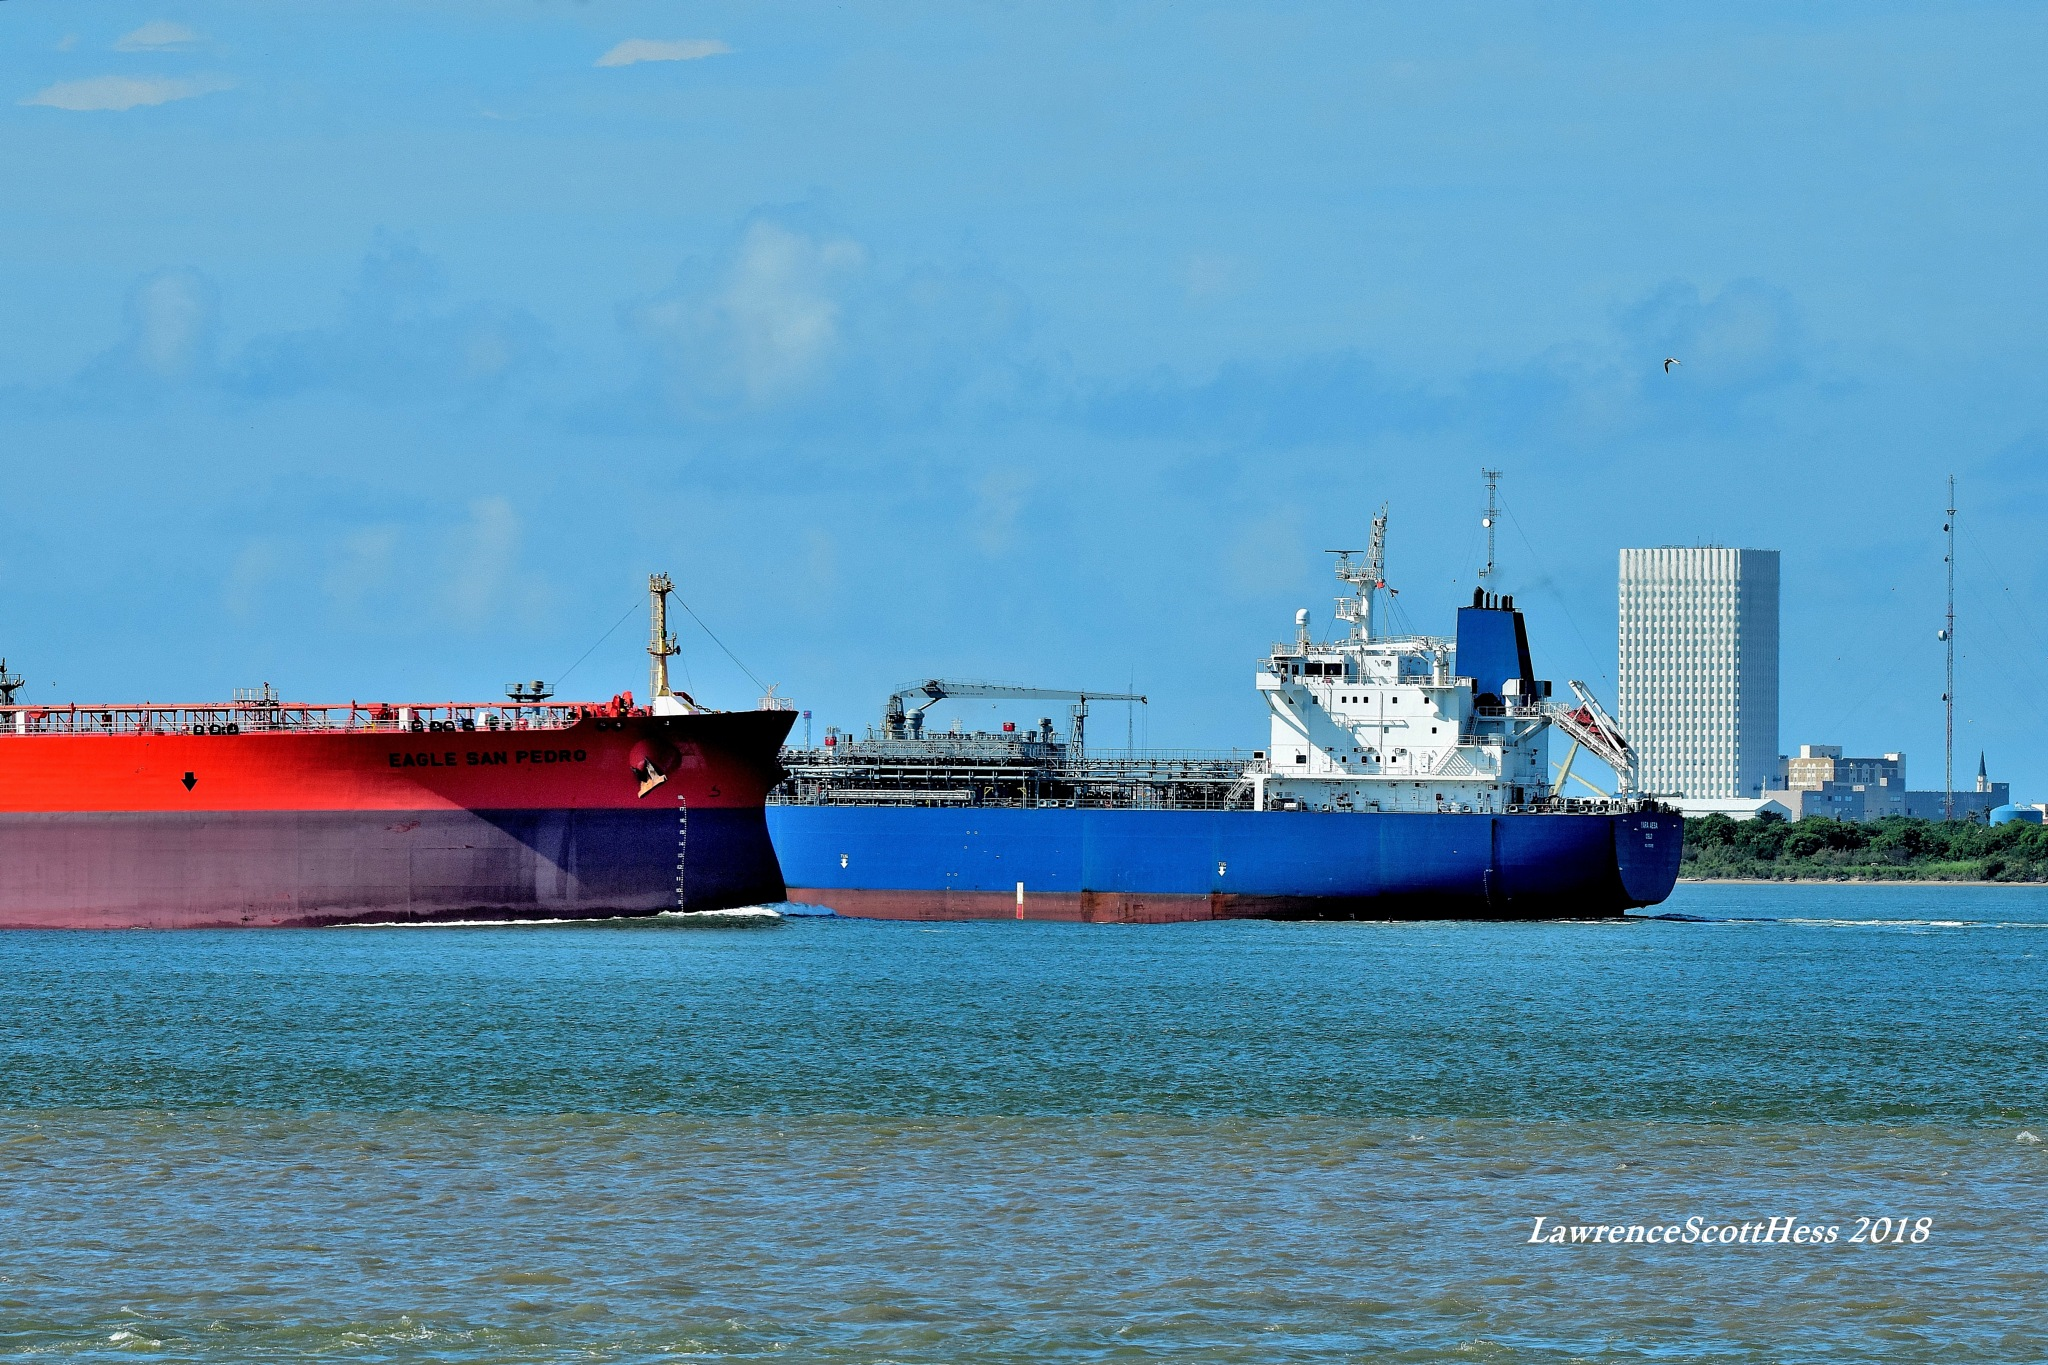 Galveston 606~Passing Ships by Lawrence Scott Hess